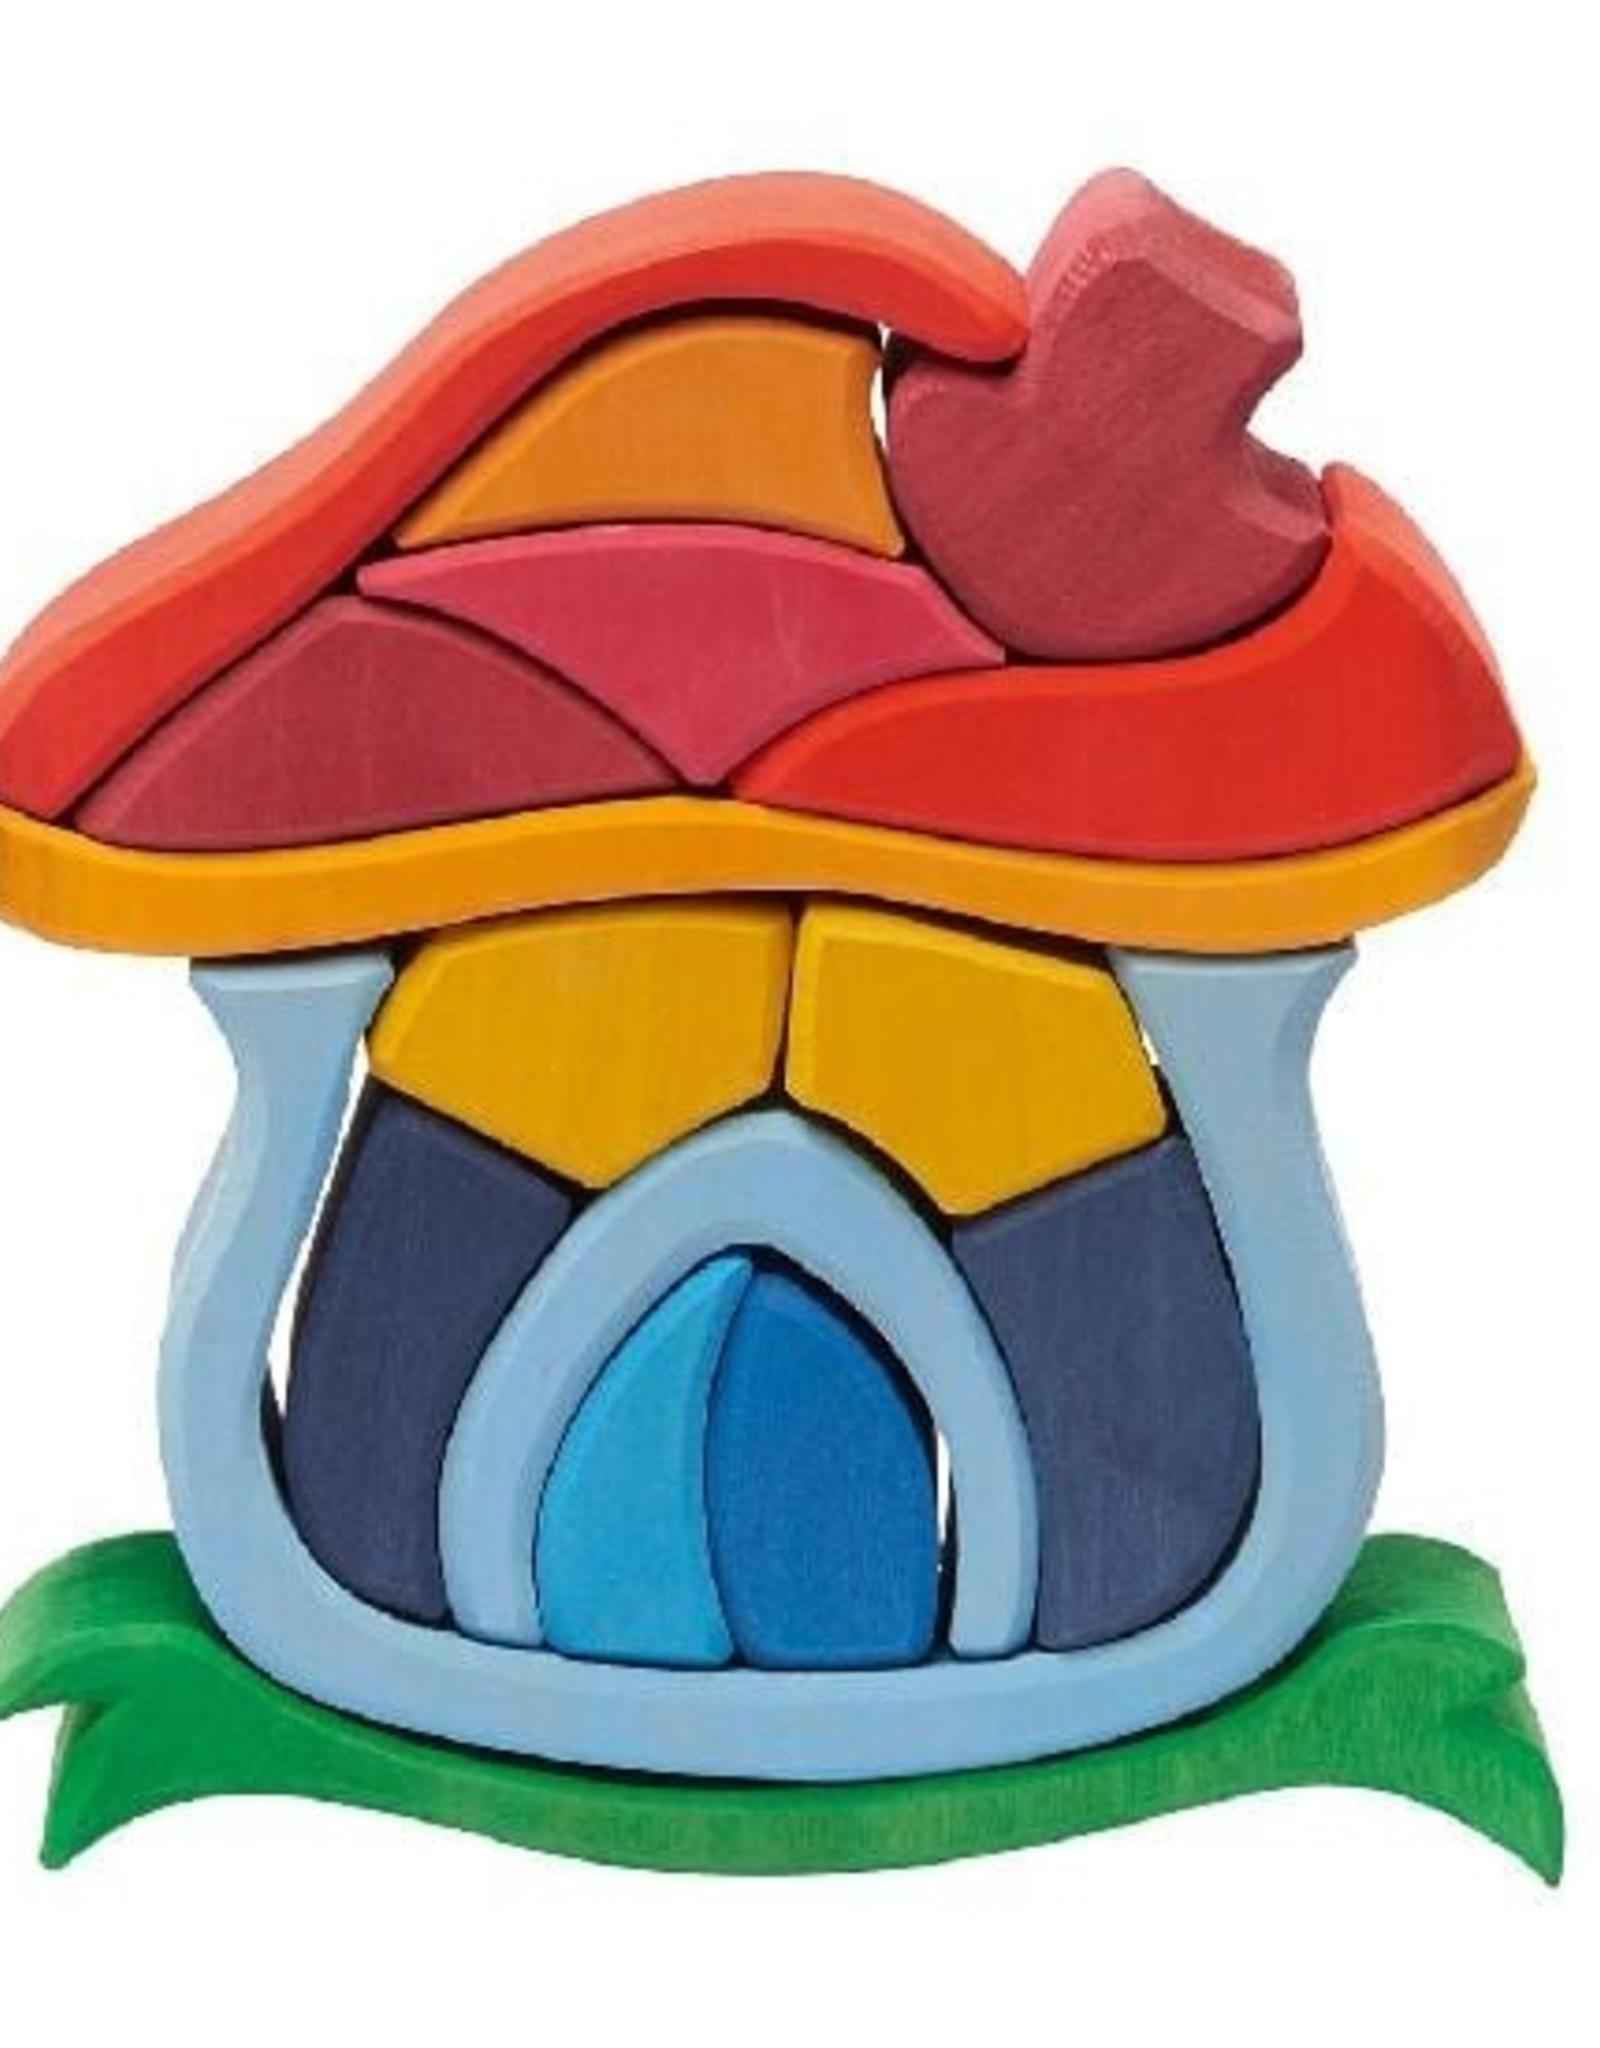 Gluckskafer Mushroom House